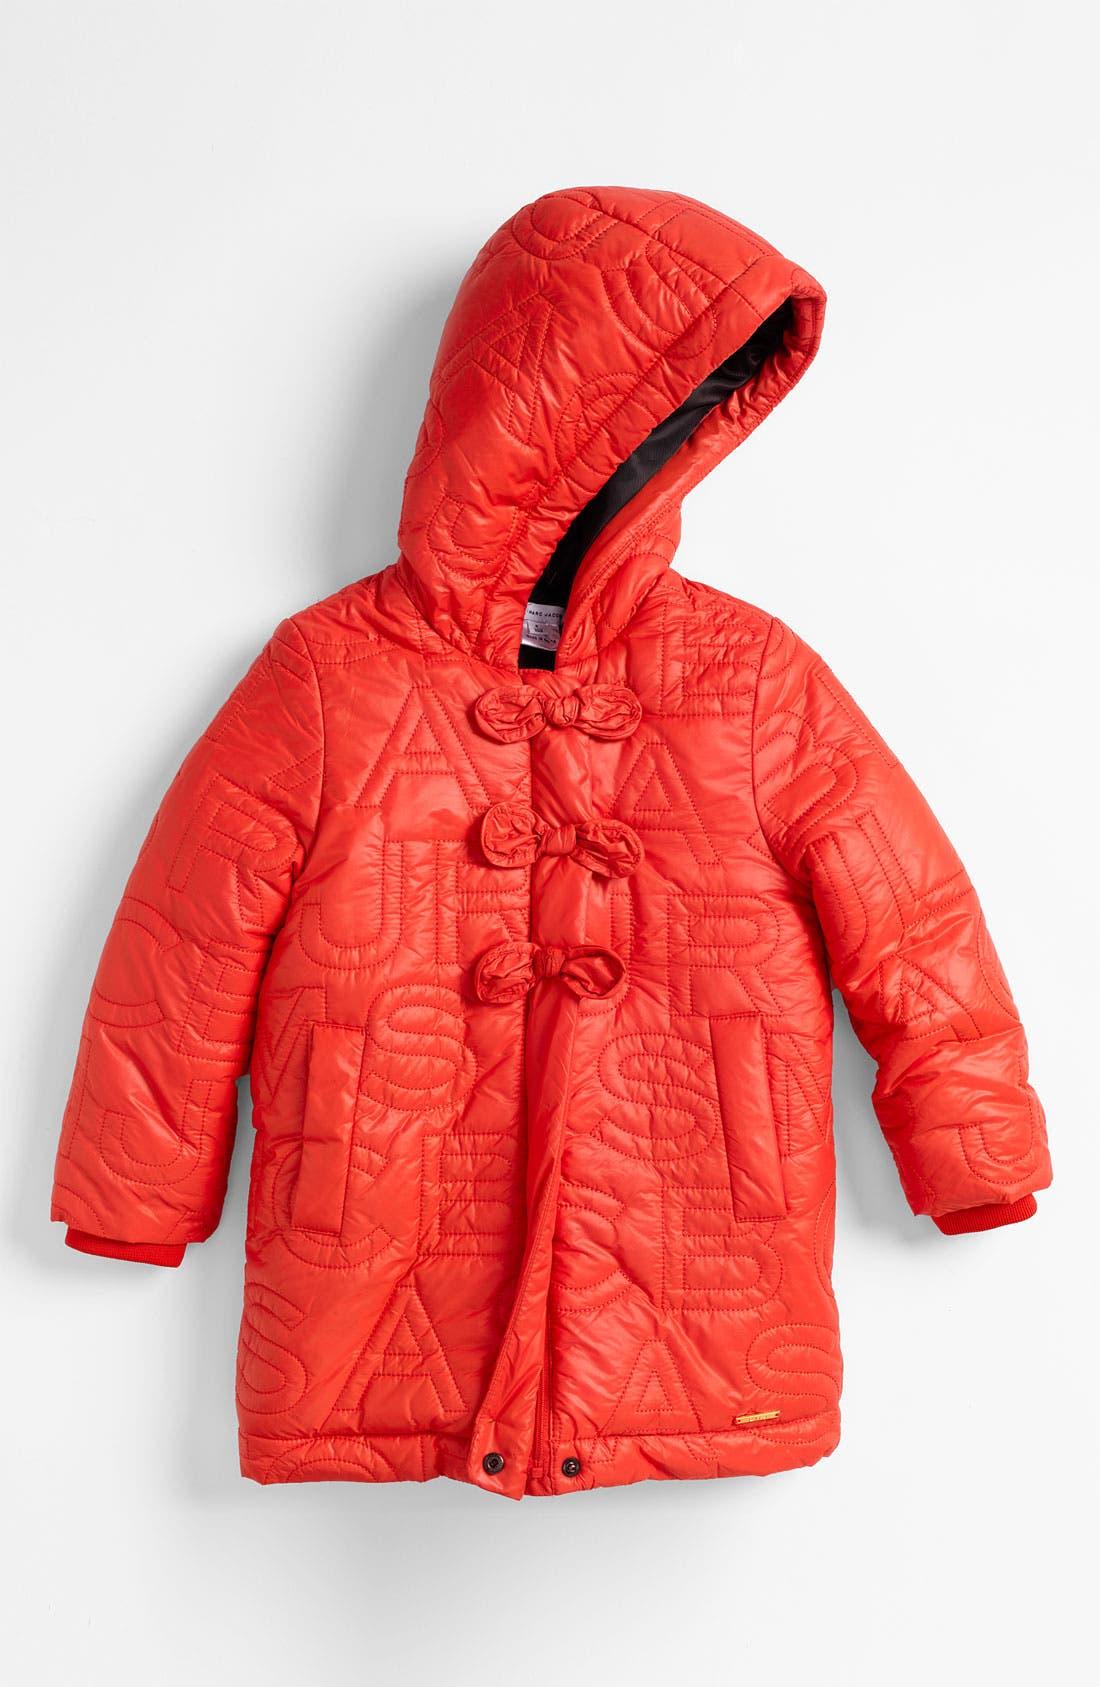 Main Image - LITTLE MARC JACOBS Embroidered Puffer Jacket (Little Girls & Big Girls)